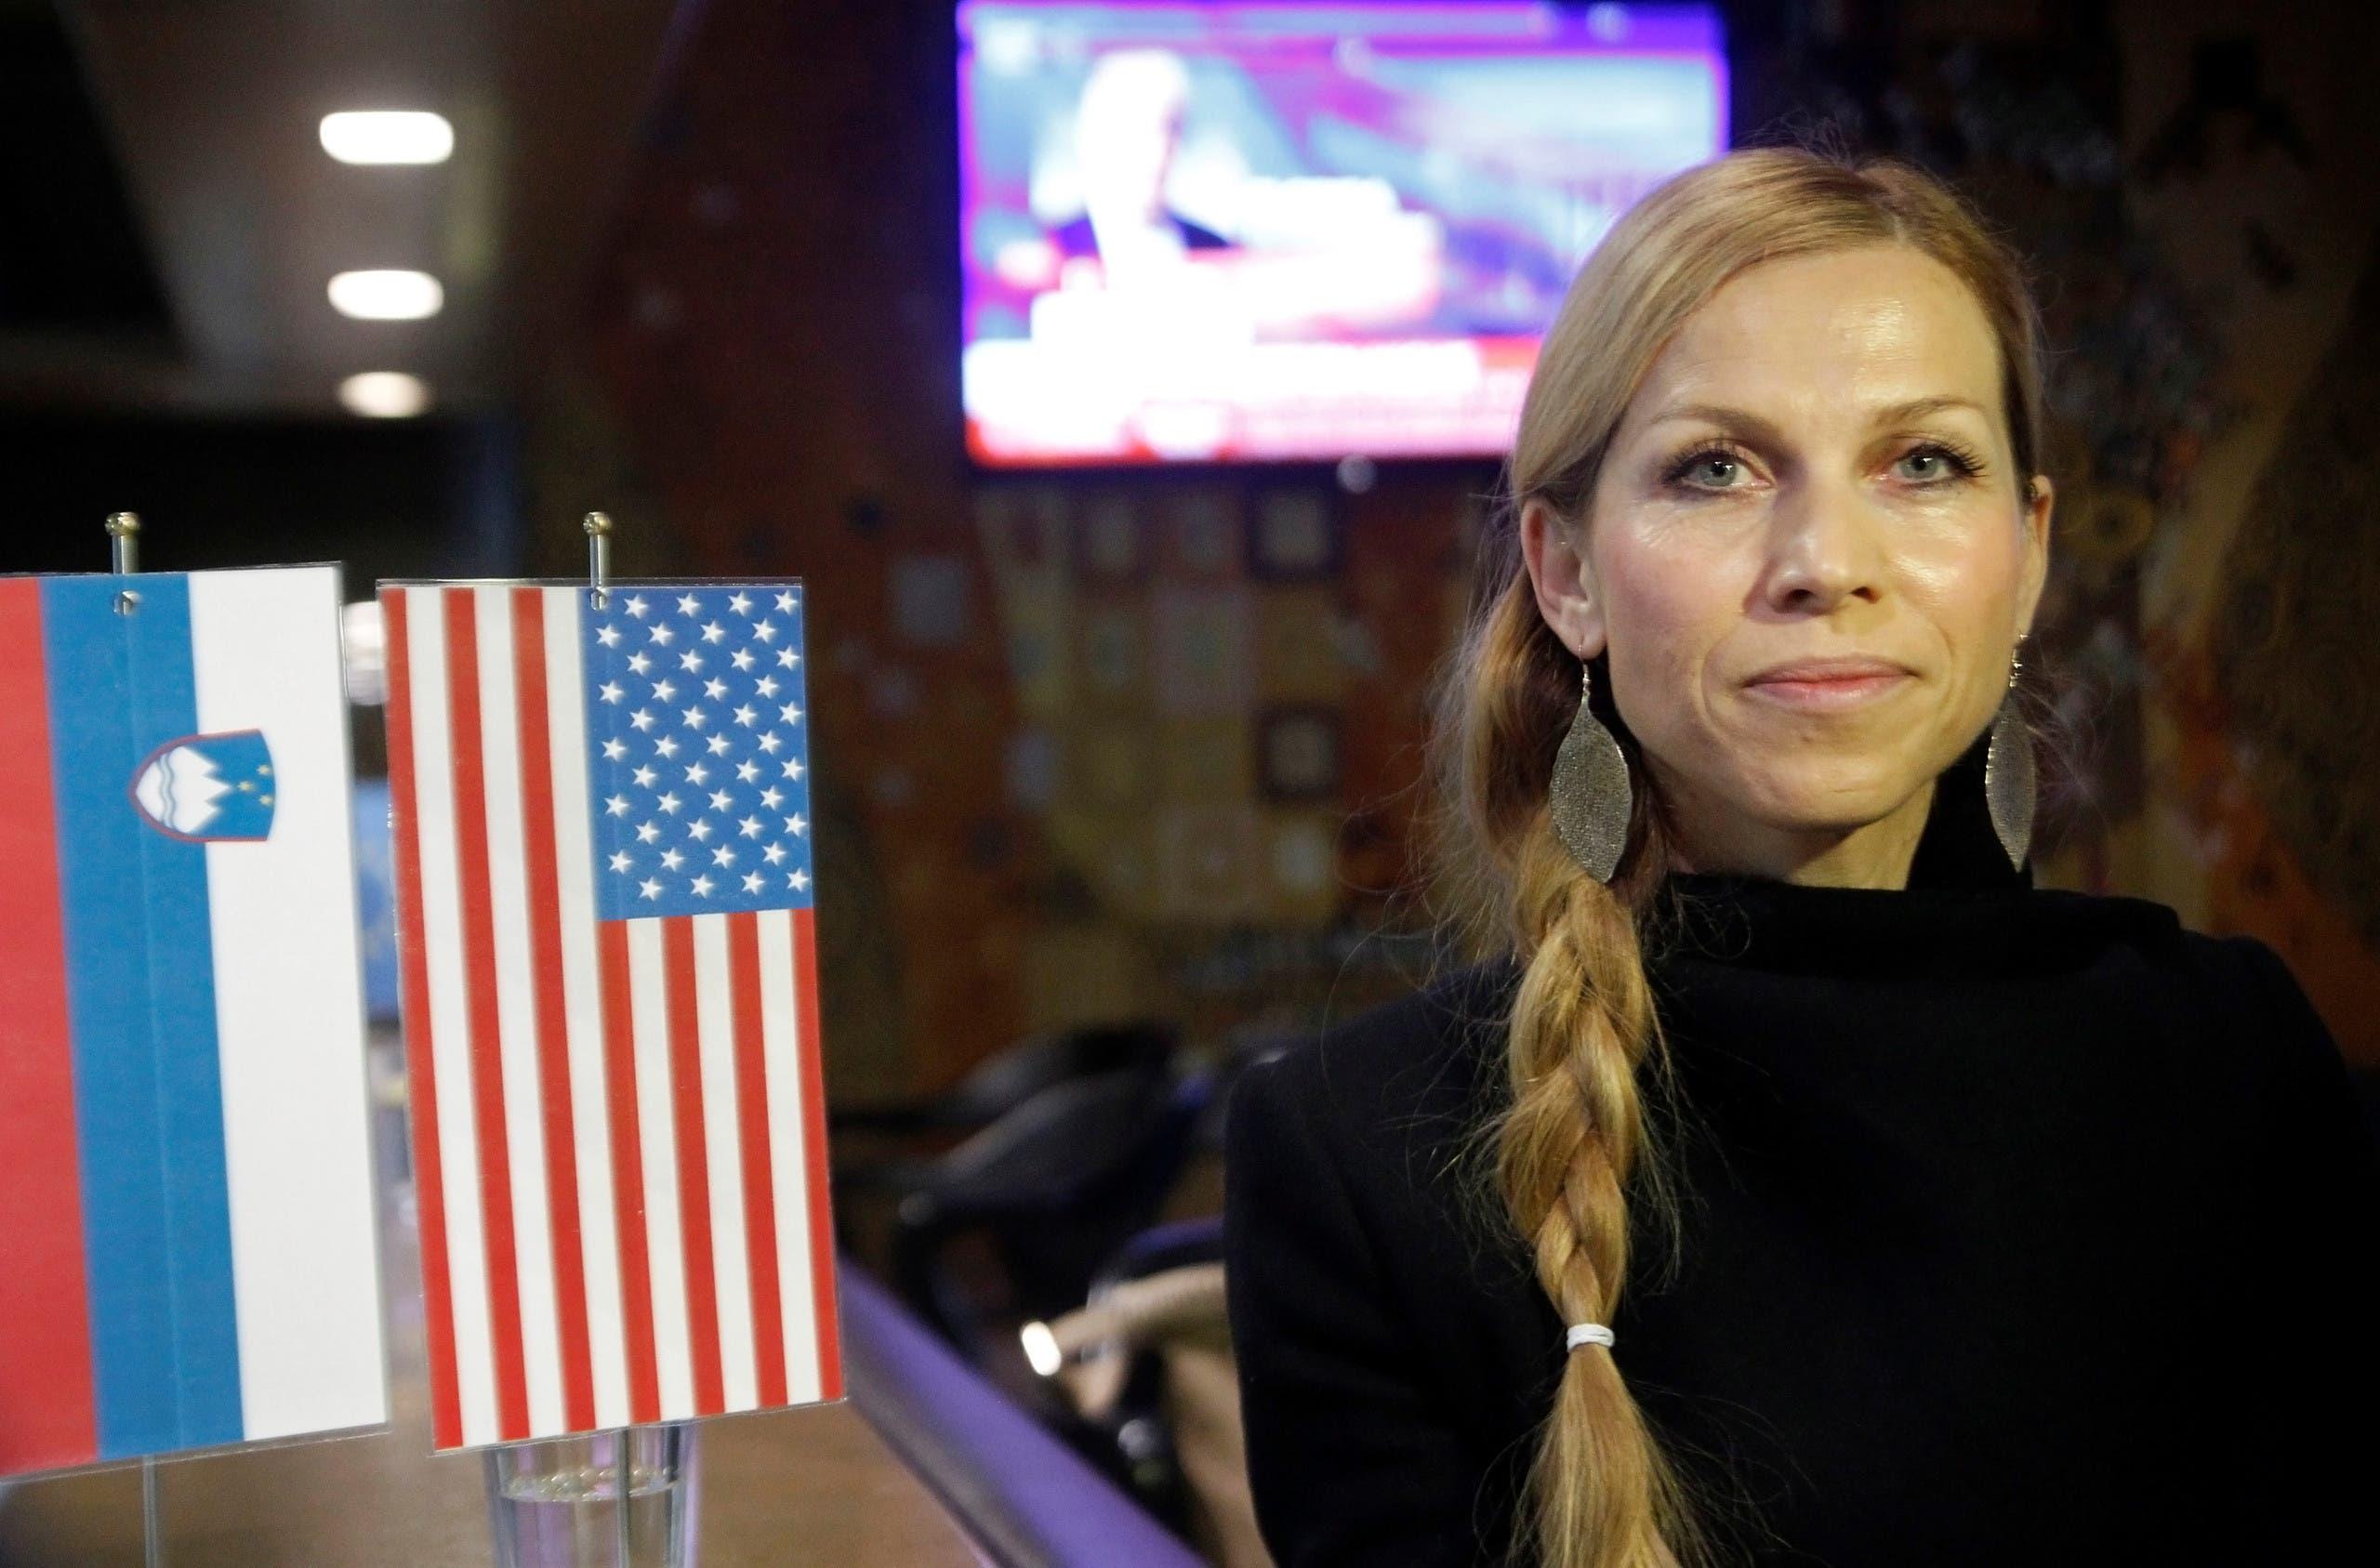 Mirjana Jelancic, a classmate of Melania Trump, poses for a picture during U.S. presidential election result in Melania Trump's hometown of Sevnica, Slovenia November 9, 2016. REUTERS/Srdjan Zivulovic